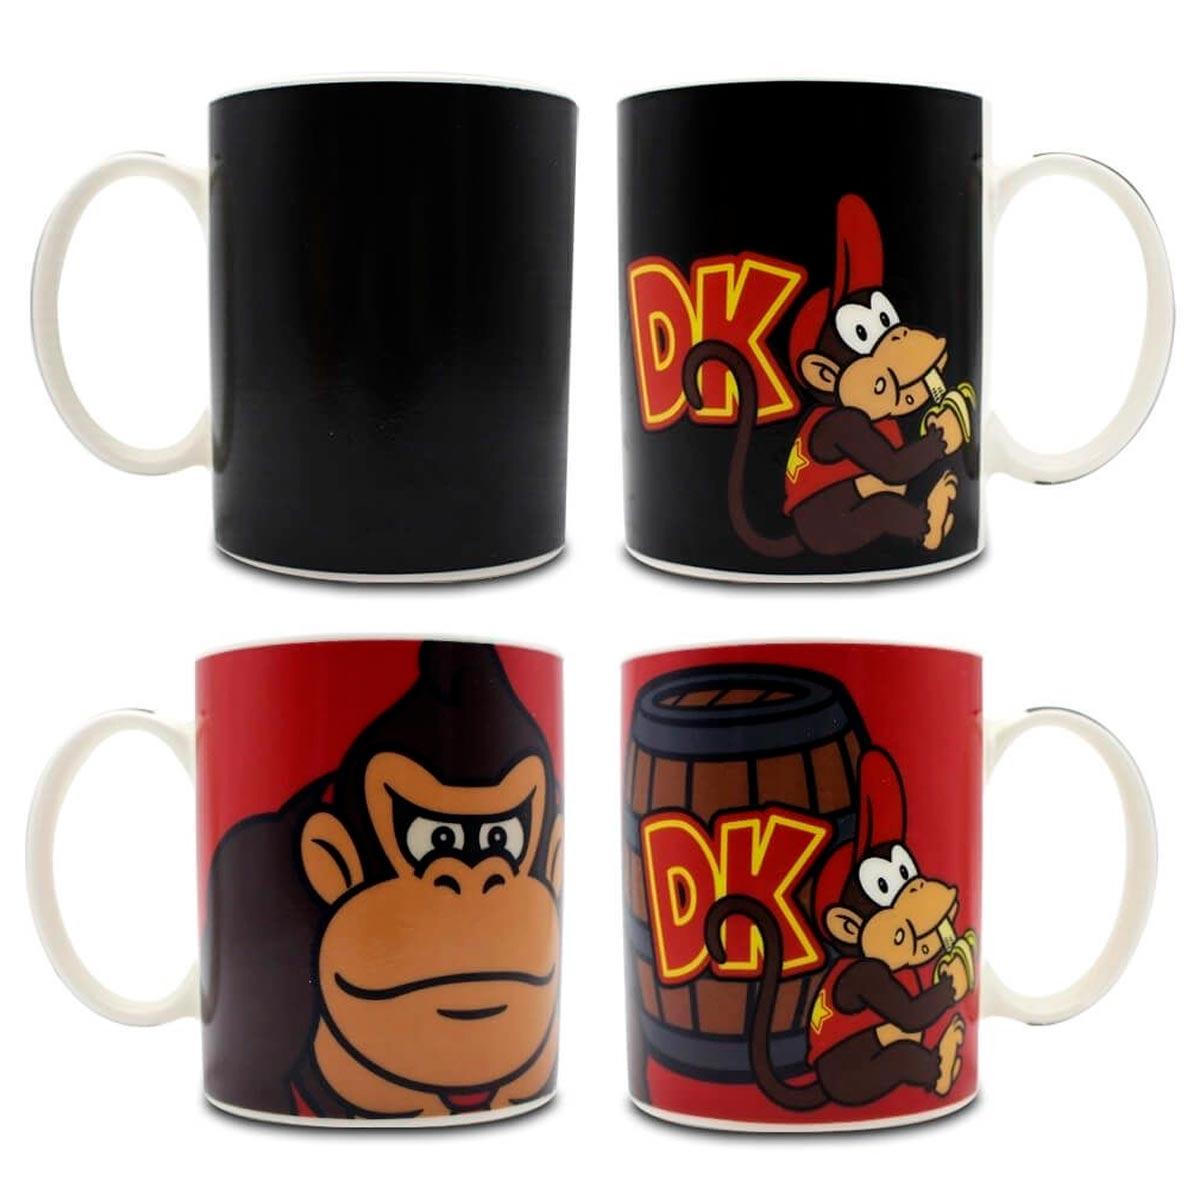 Caneca Mágica Termossensível Donkey Kong